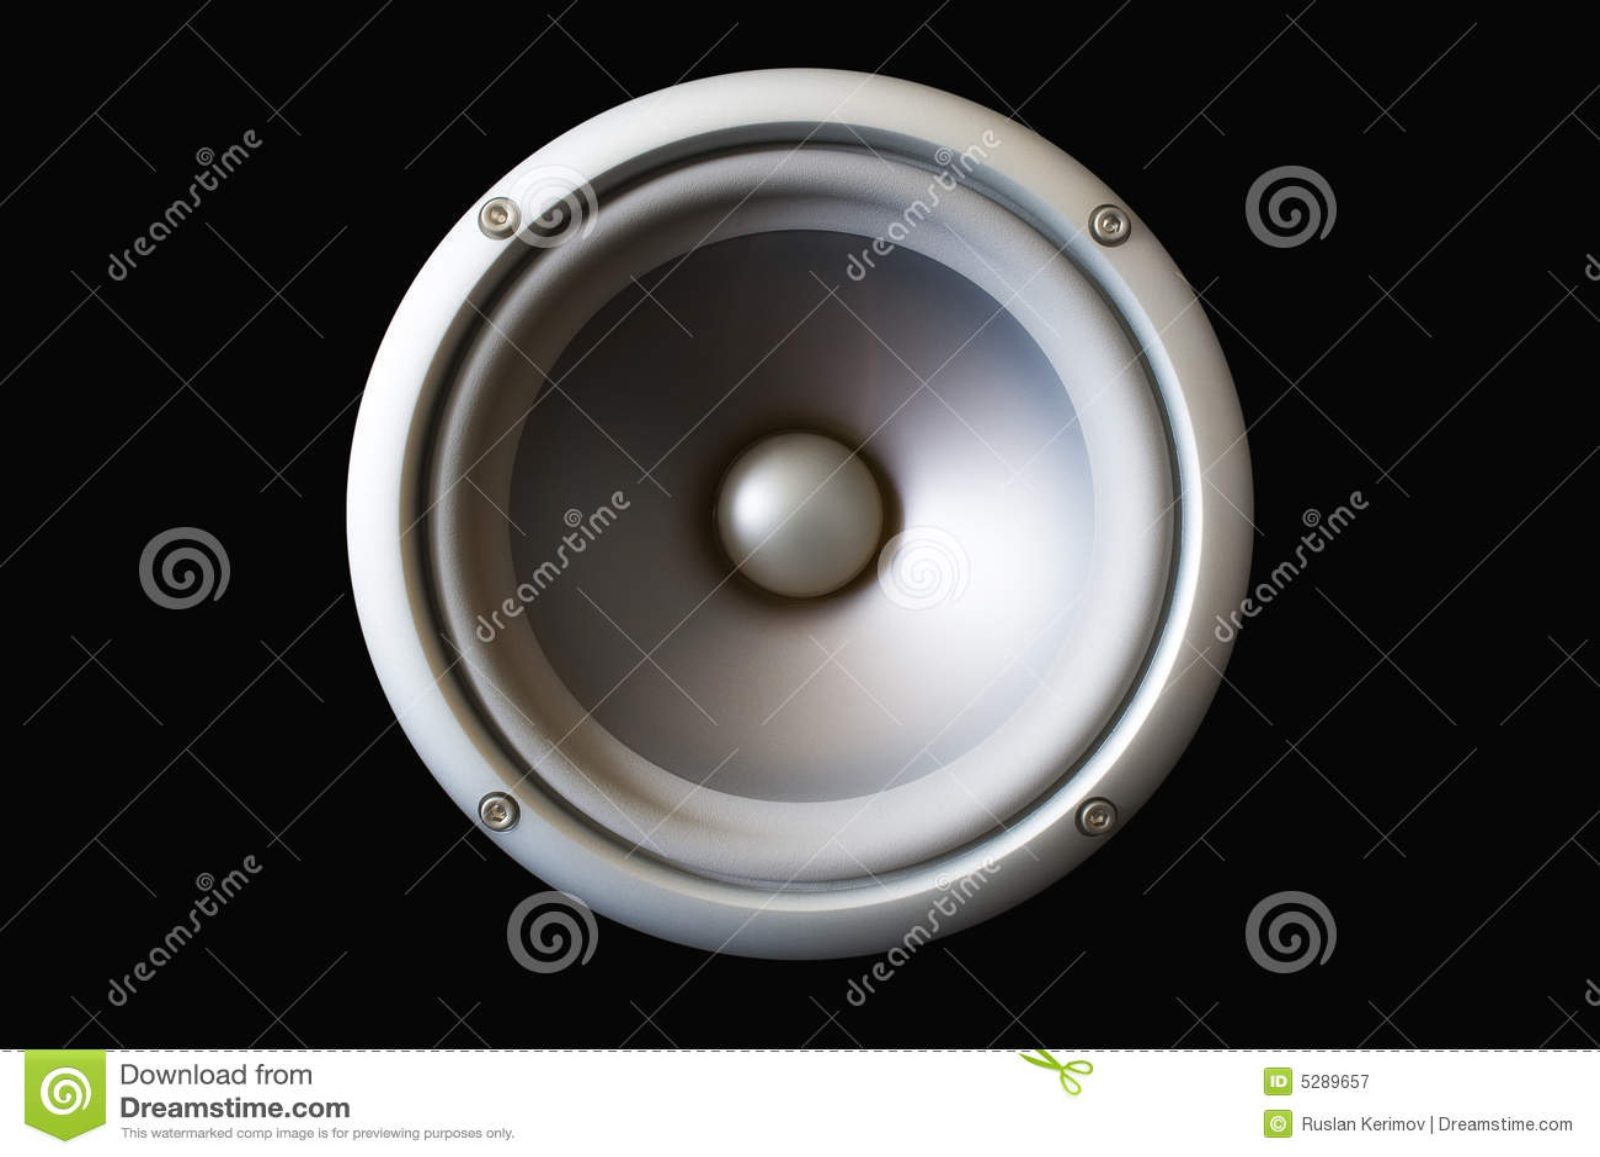 how to delete sound playback on desktop